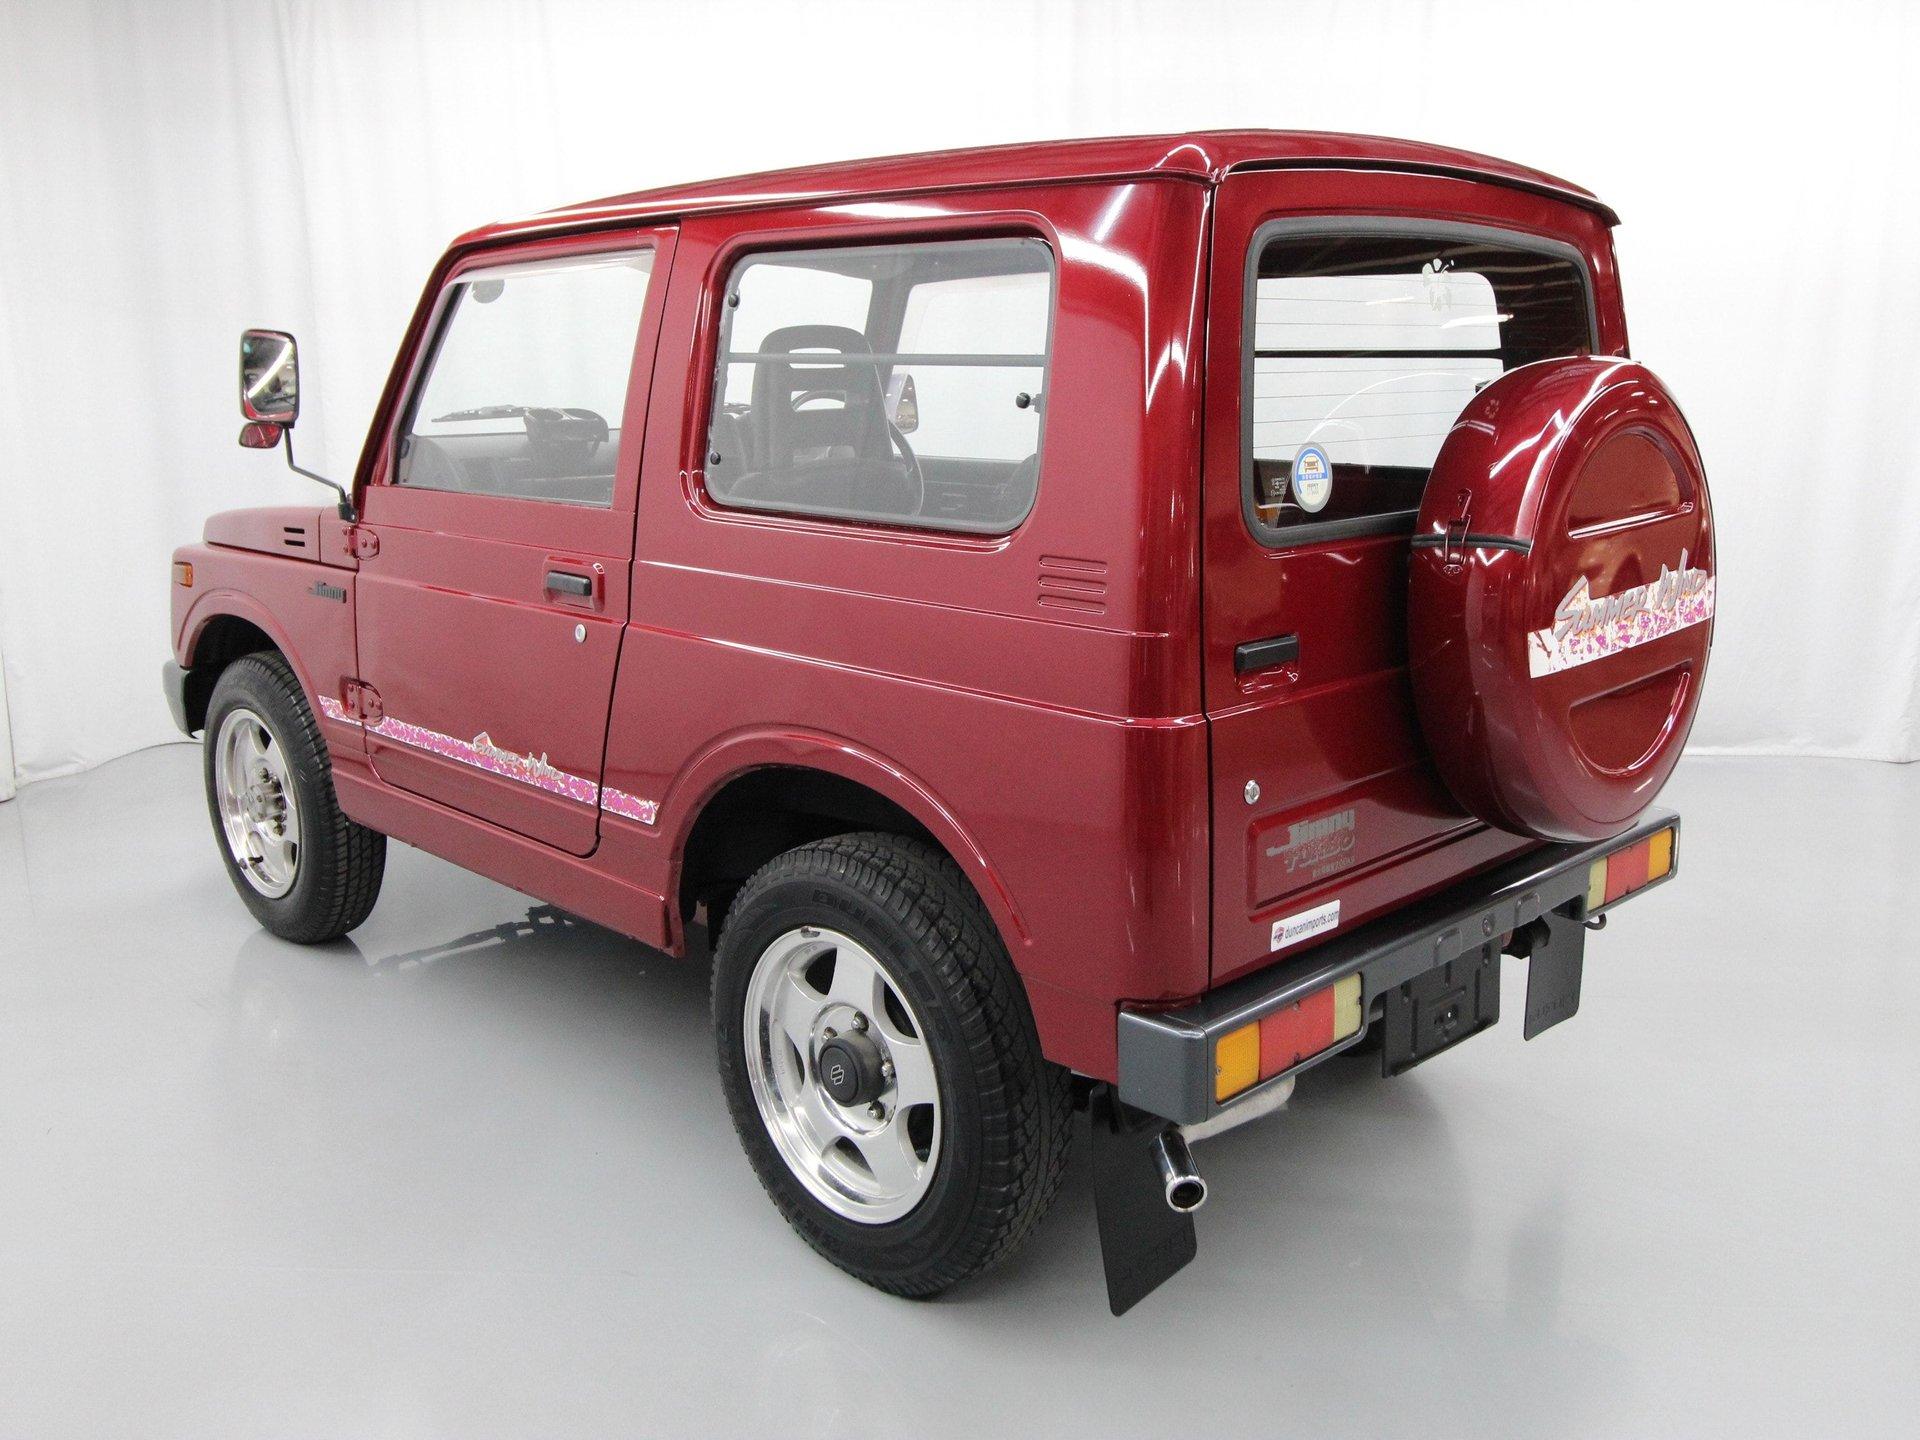 1995 Suzuki Jimny